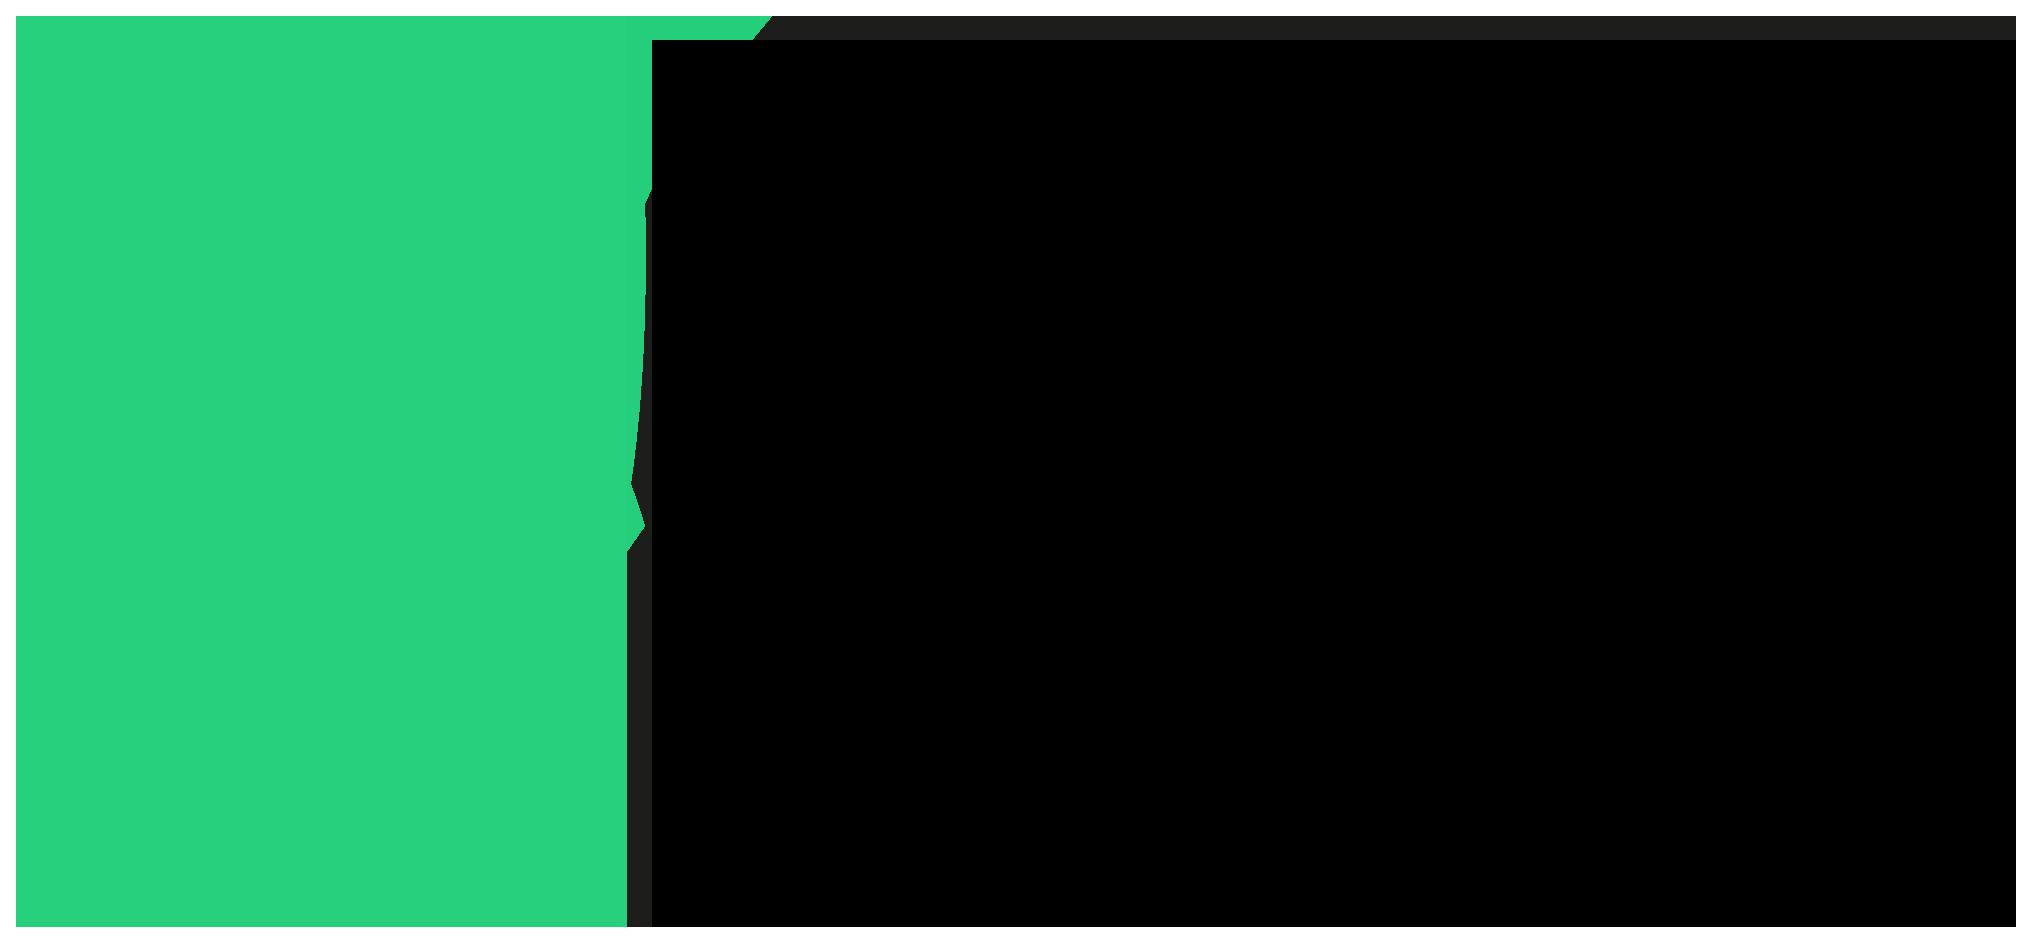 BL - Logo lock up green leaf_horizontal.png